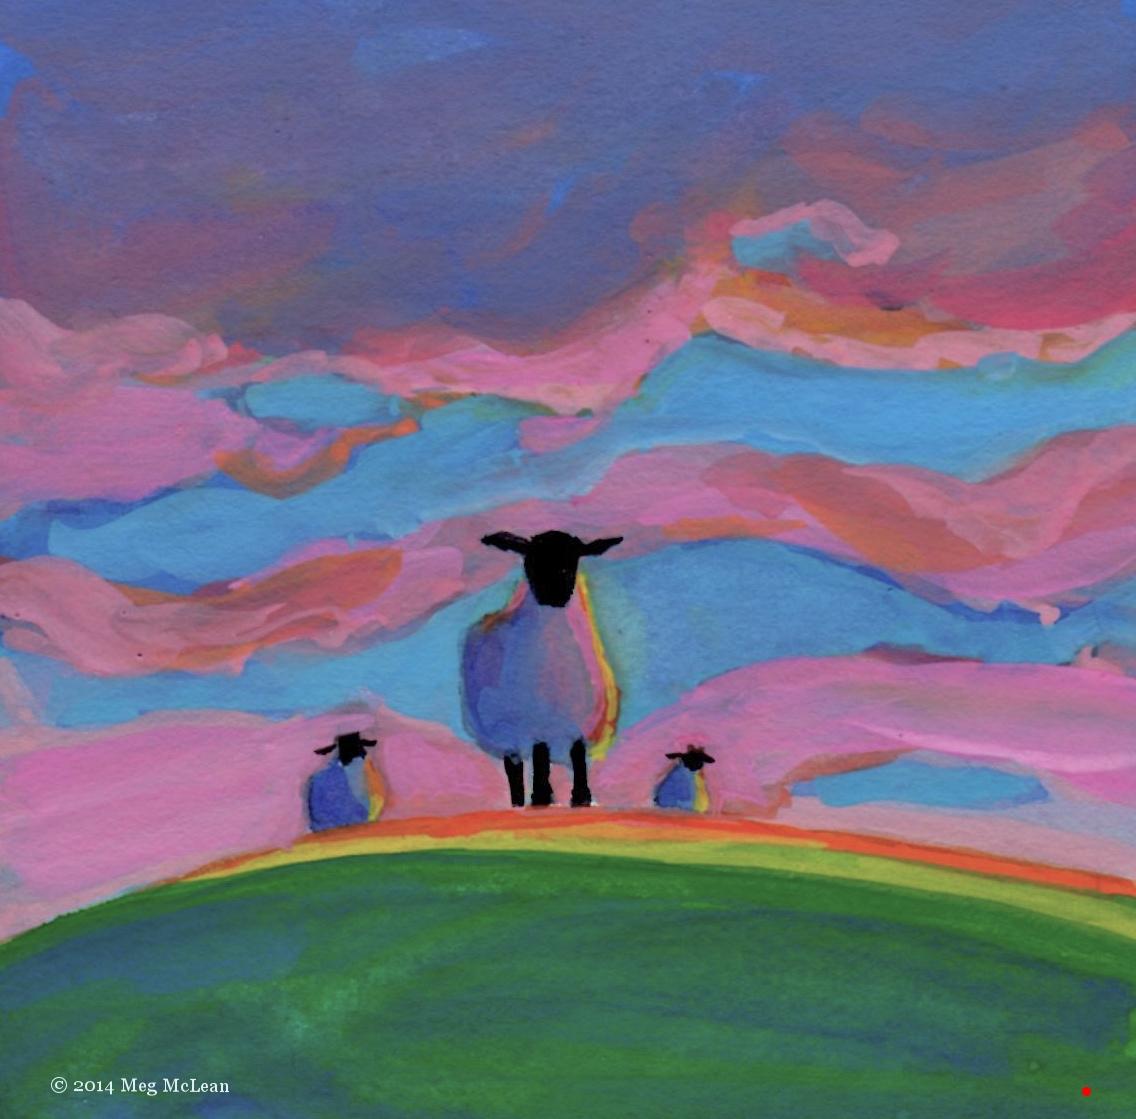 Meg McLean sunset sheep